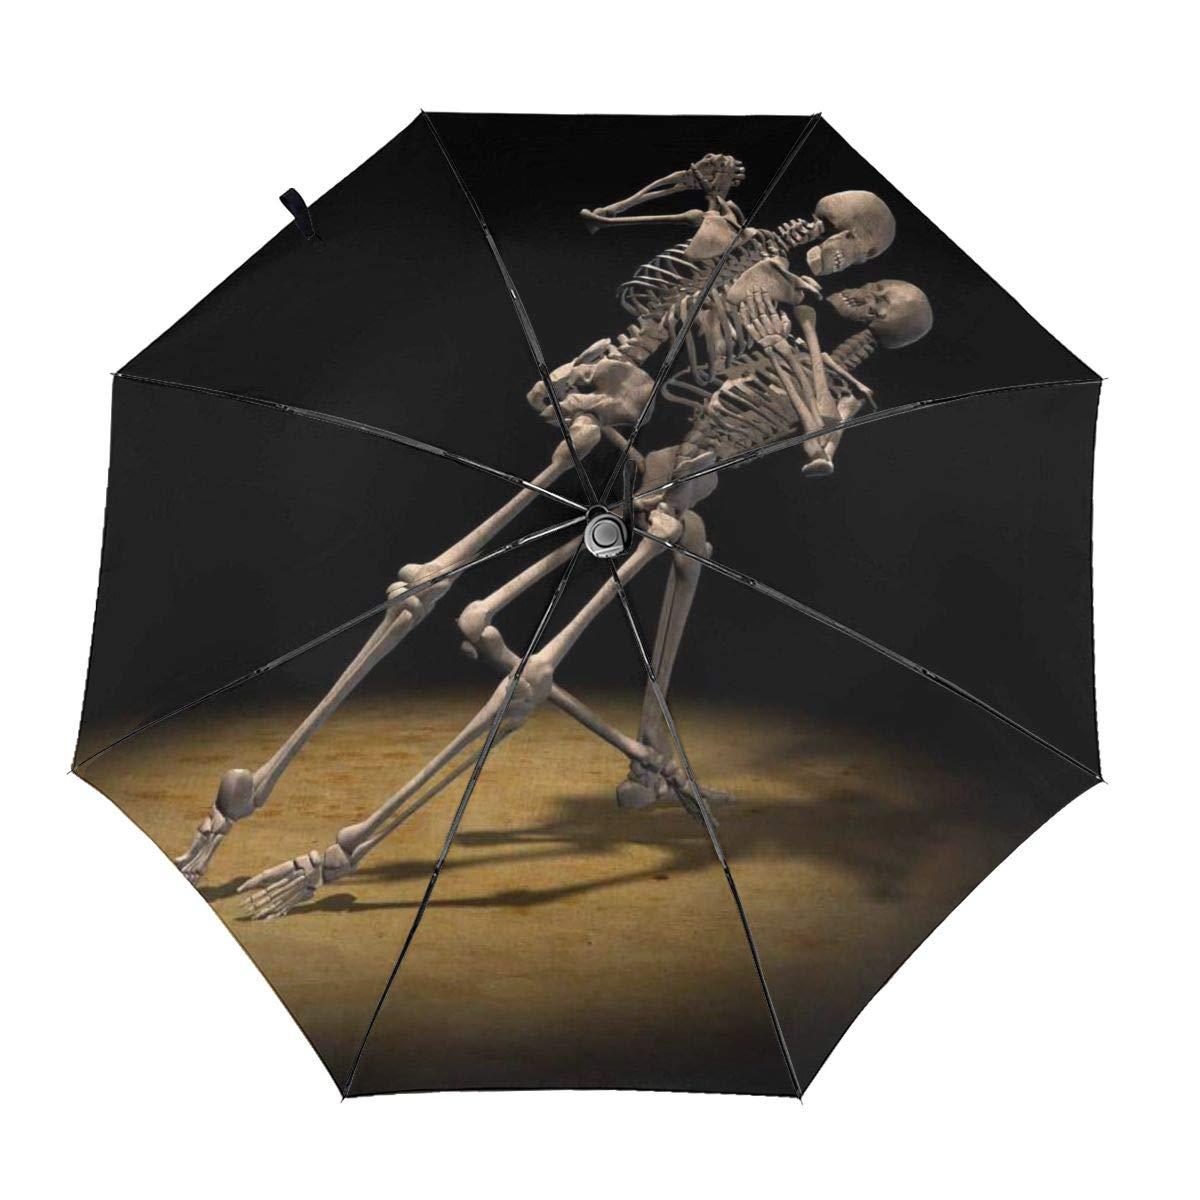 Sun Travel Umbrella UV Protection Rain Tri-Fold Umbrella Dance Skeleton, Windproof, Auto Open Close, Ergonomic Handle, Light Weight Compact & Portable Umbrellas For Women Men by Jaylon